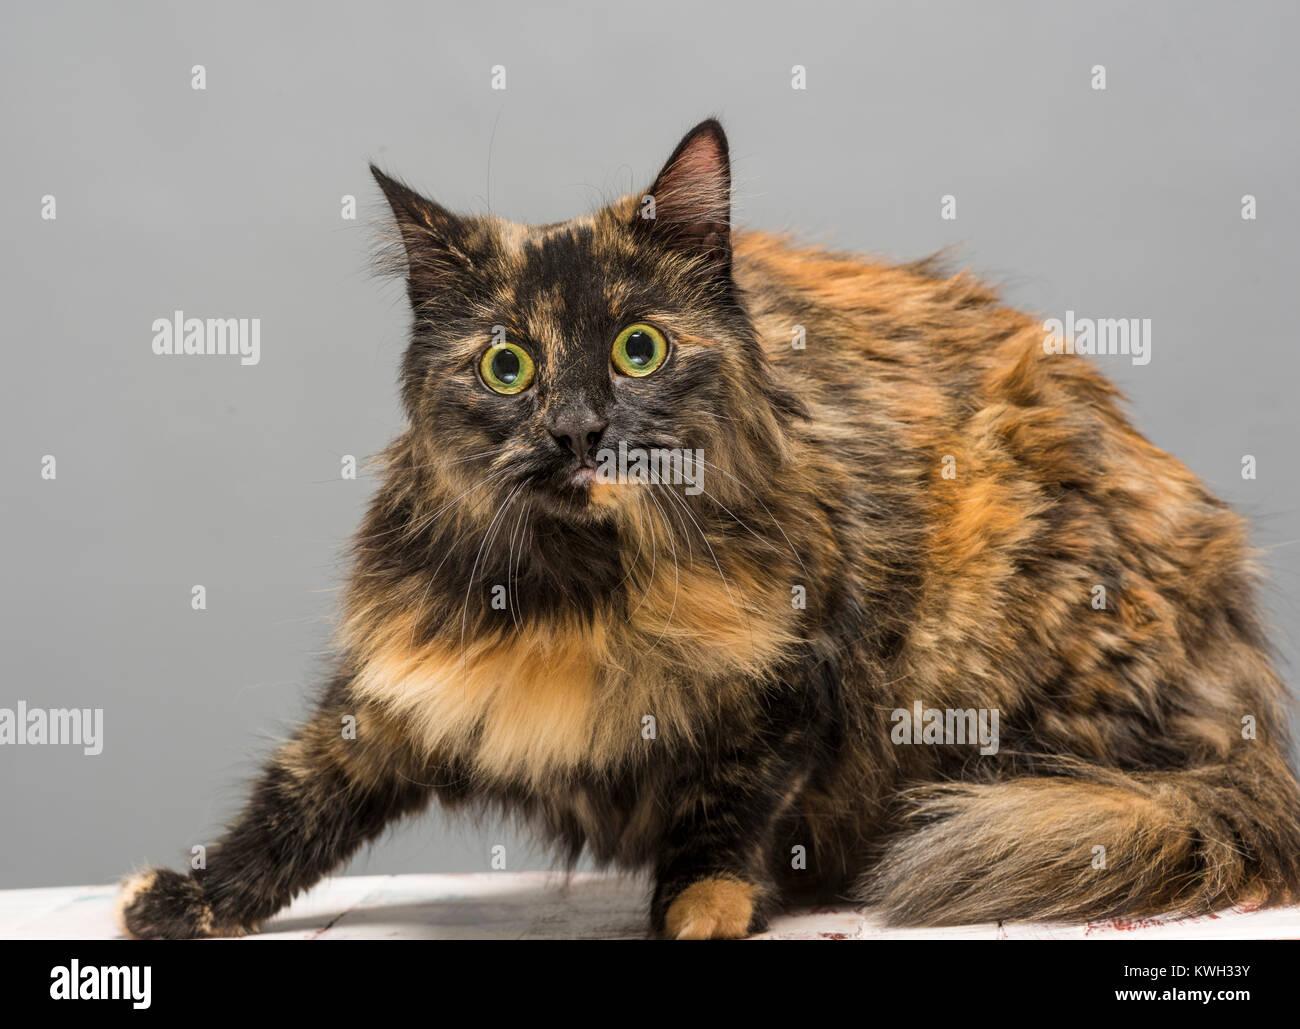 Langhaarige inländischen tabby Cat suchen Alert Stockbild